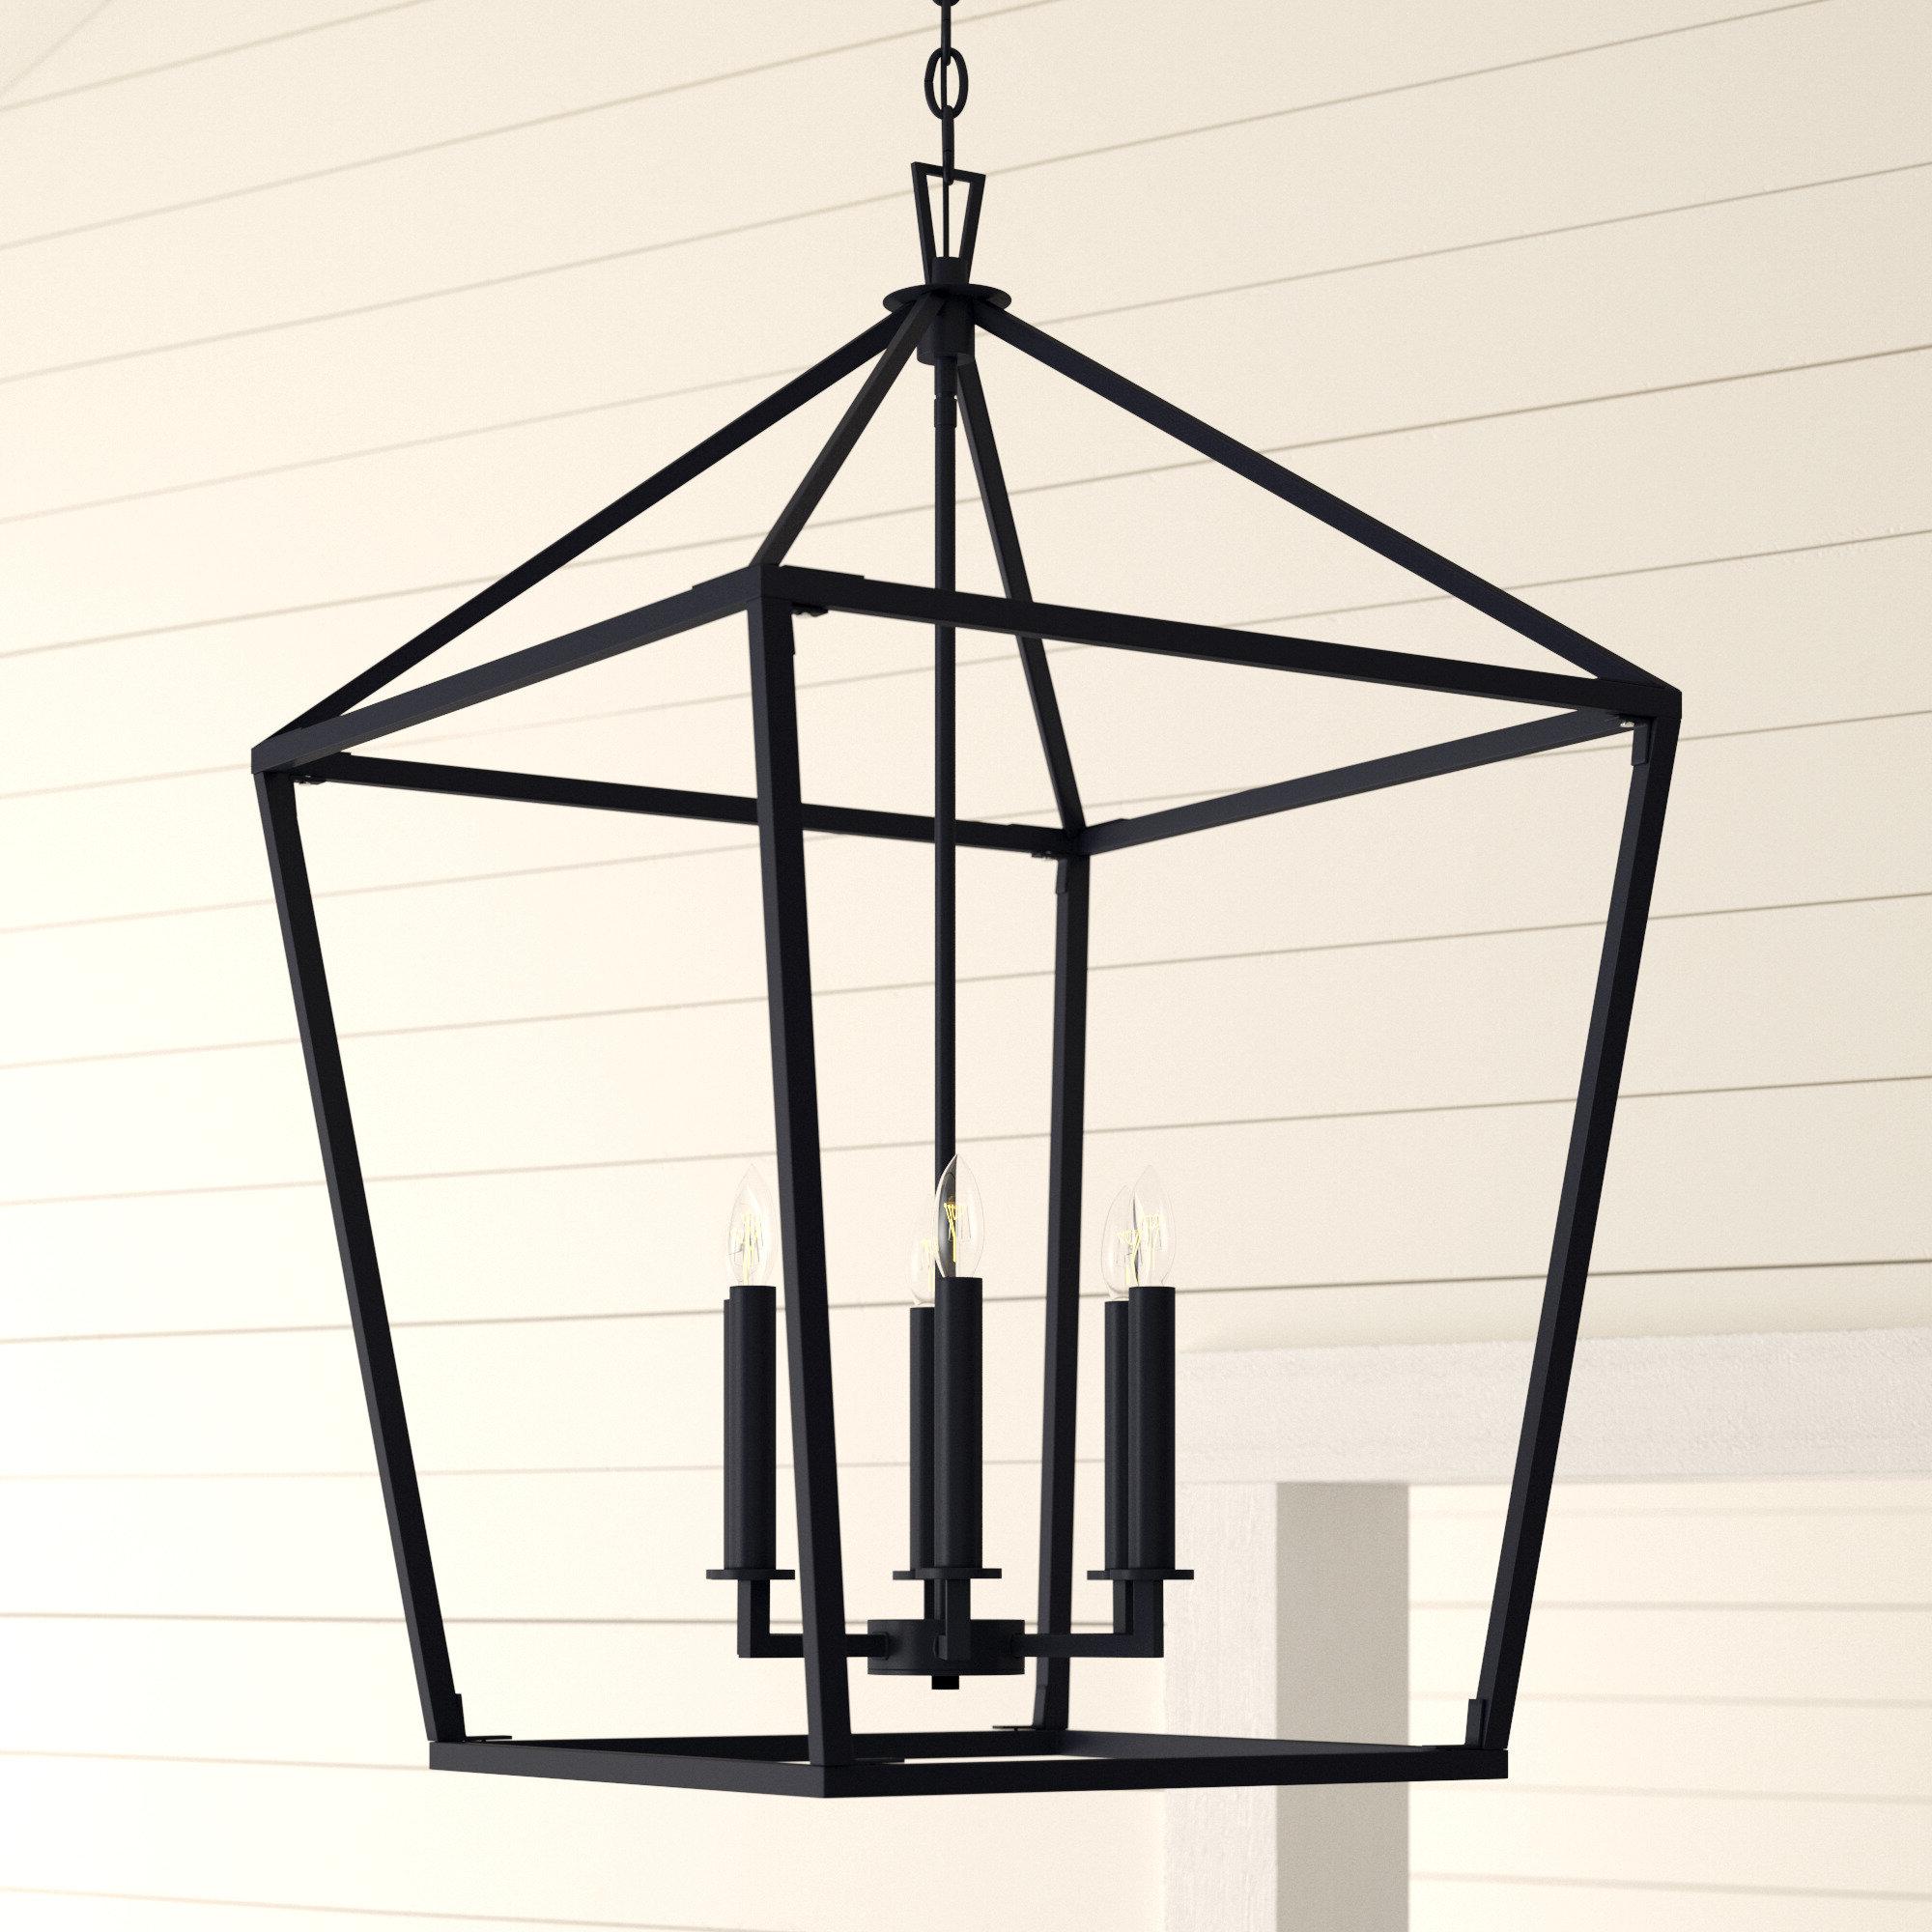 Israel 6 Light Lantern Geometric Pendant Throughout Trendy William 4 Light Lantern Square / Rectangle Pendants (Gallery 24 of 25)